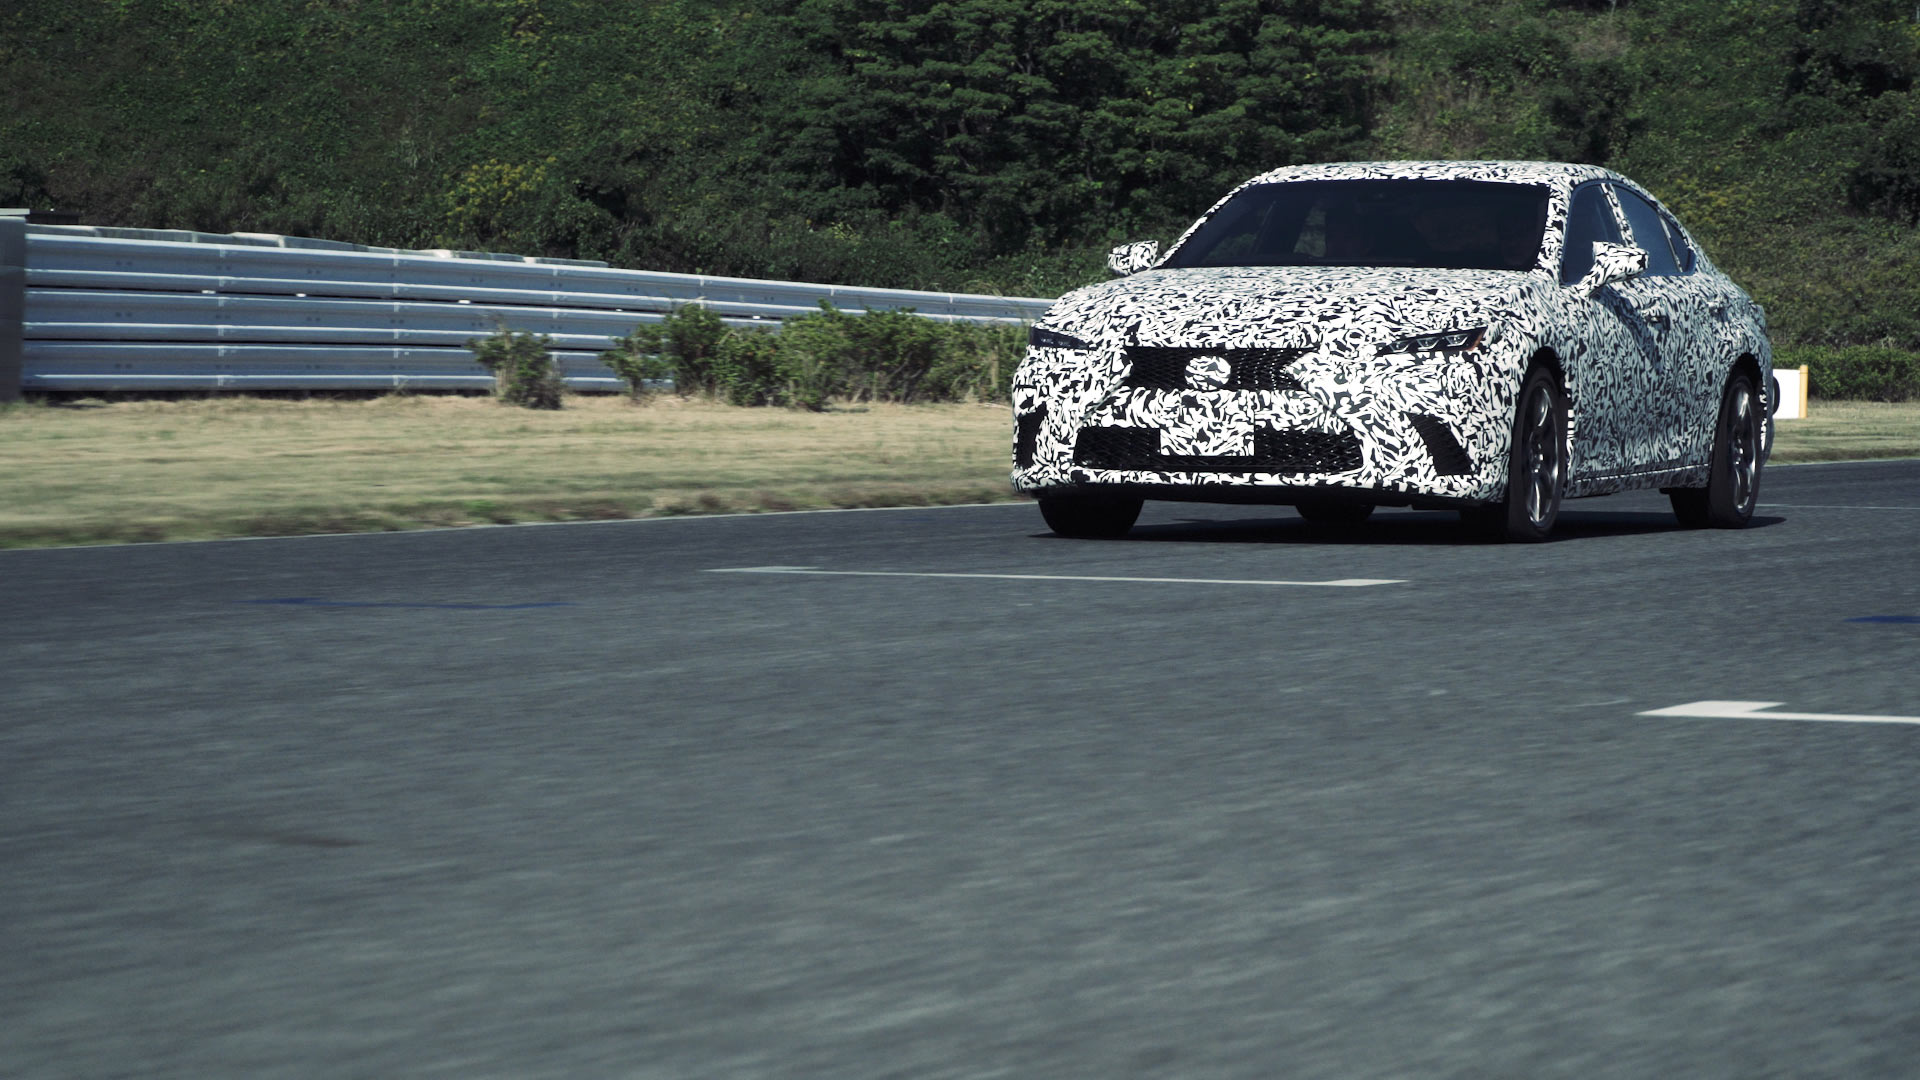 Lexus Direct4 Galleryitem 02 1920x1080px